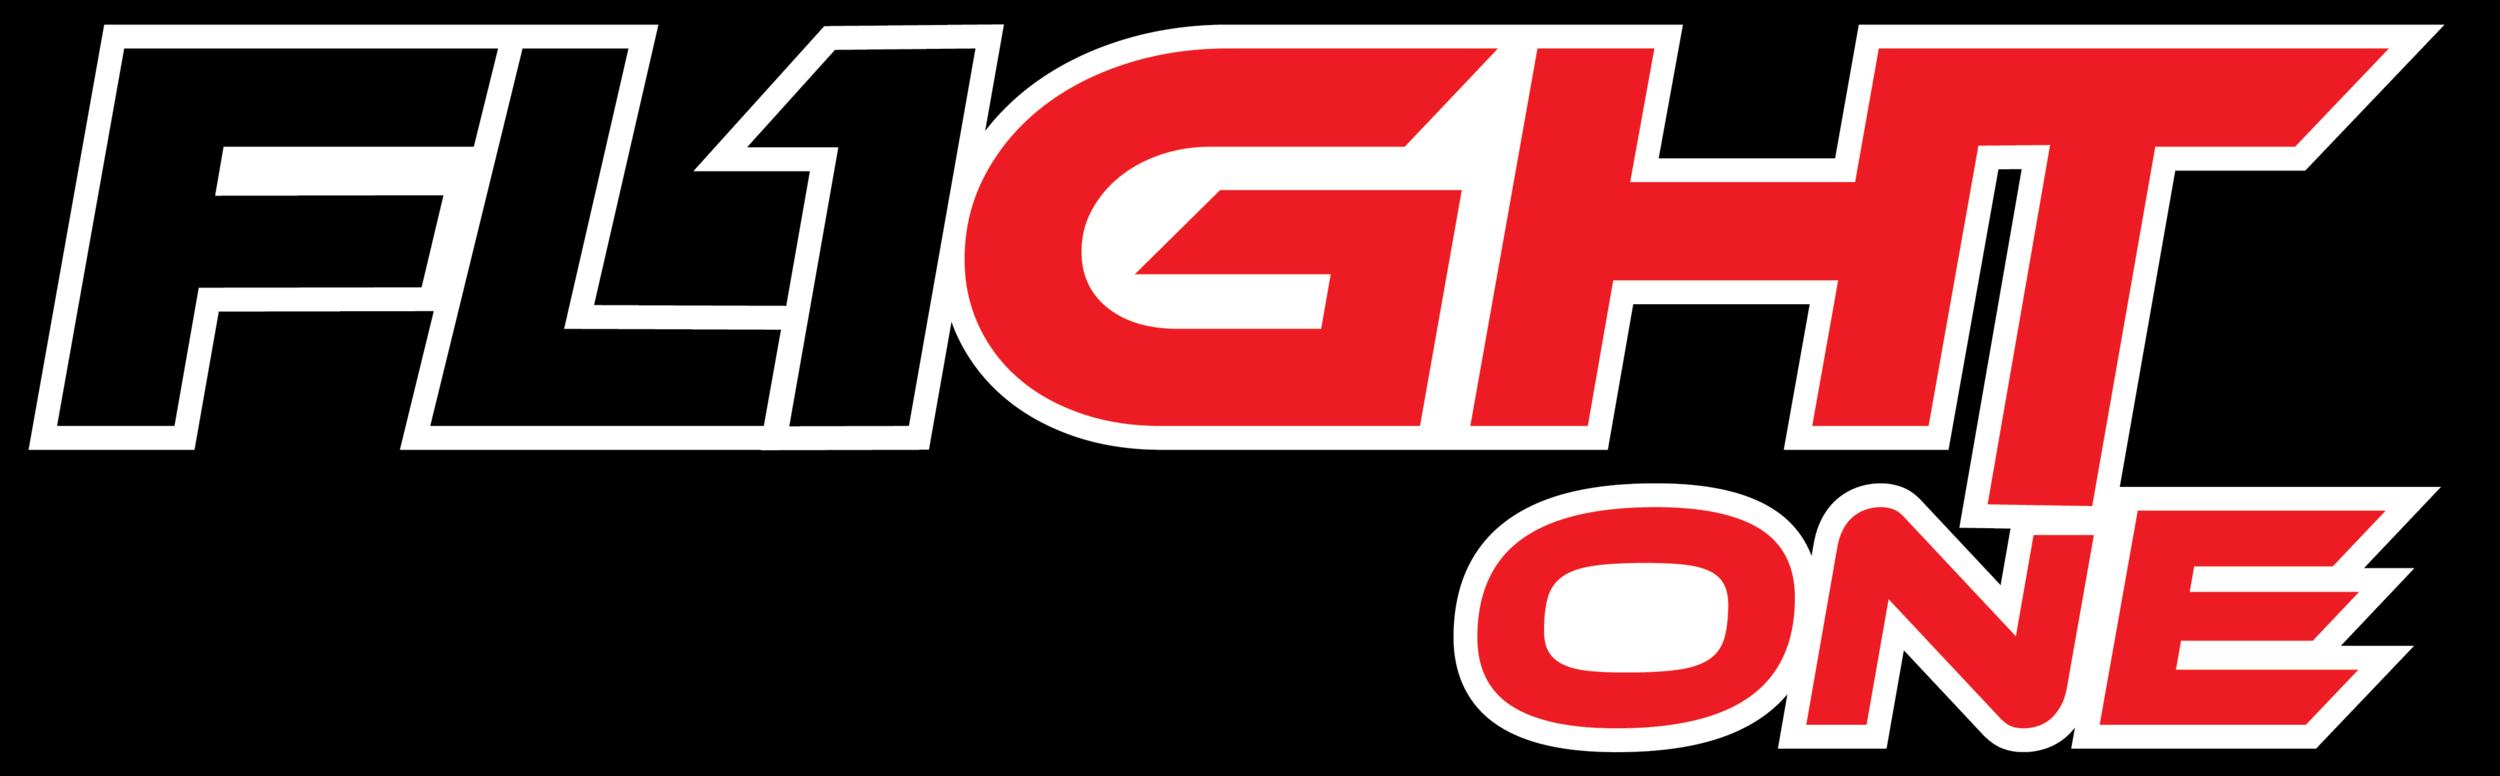 flightone logo.png